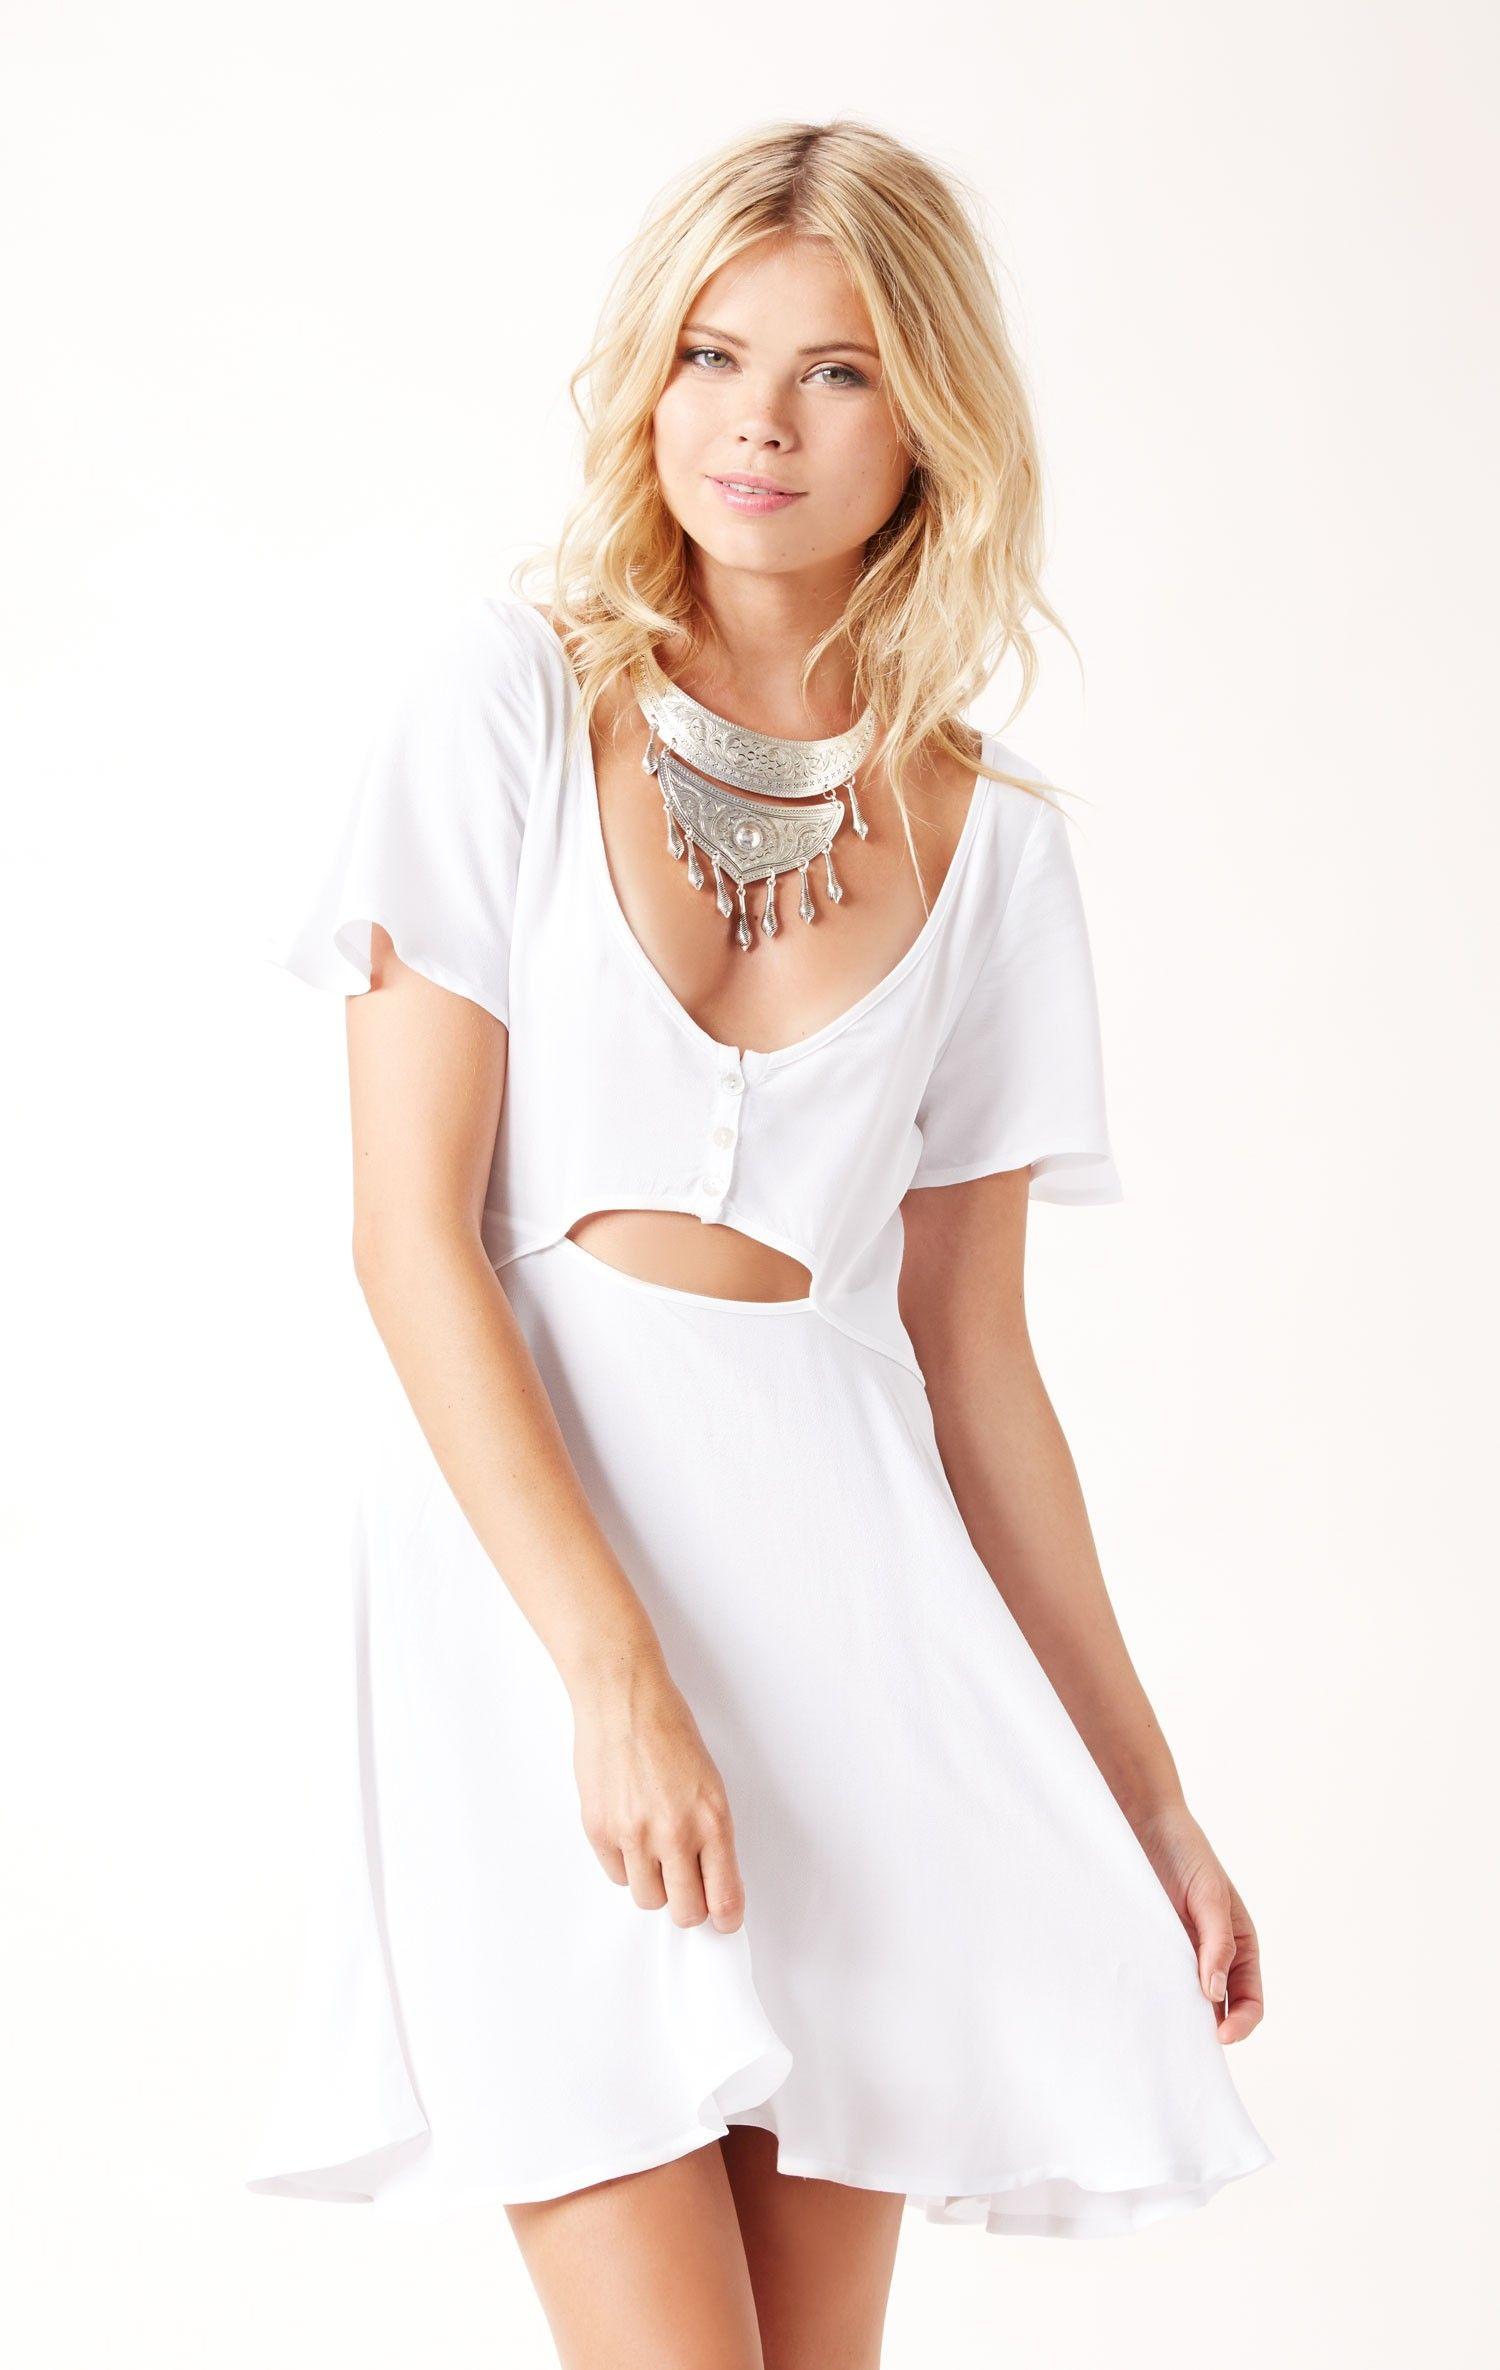 Short peekaboo dress things to wear pinterest shorts boho and